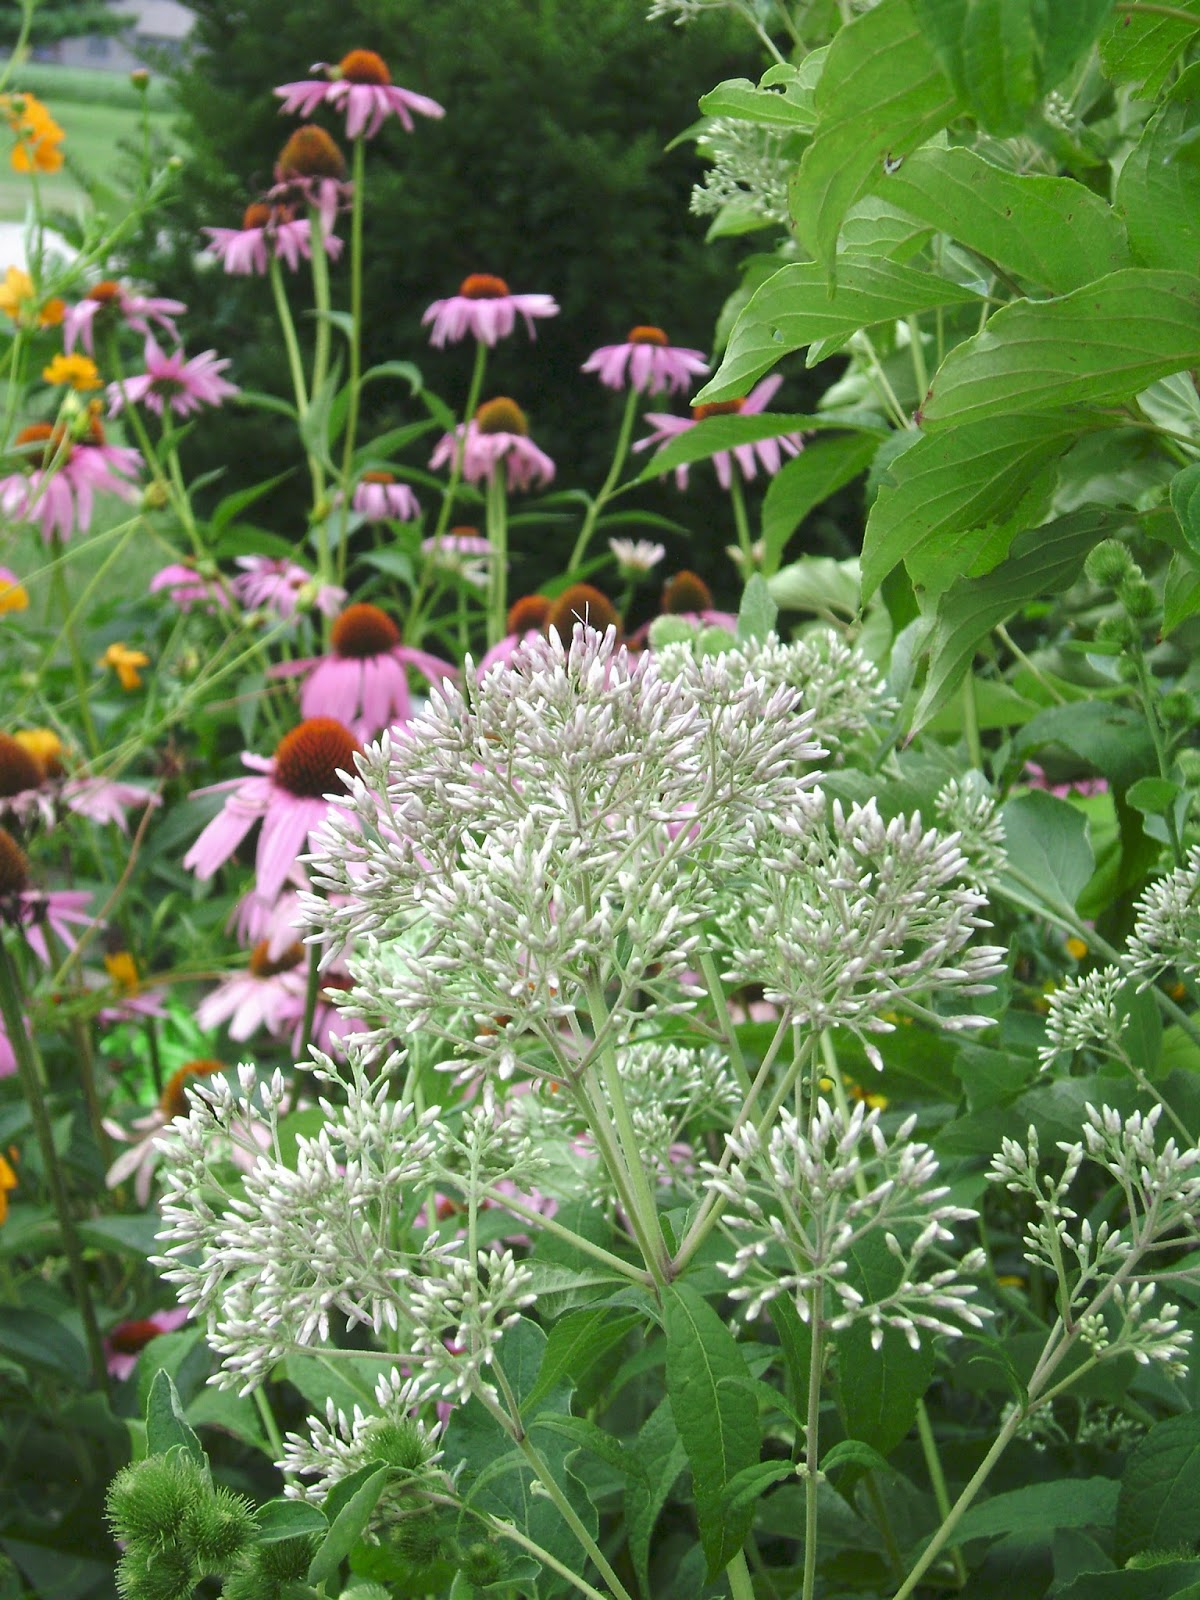 Prairie rose 39 s garden wildflower wednesday no ordinary joe for Joe pye weed